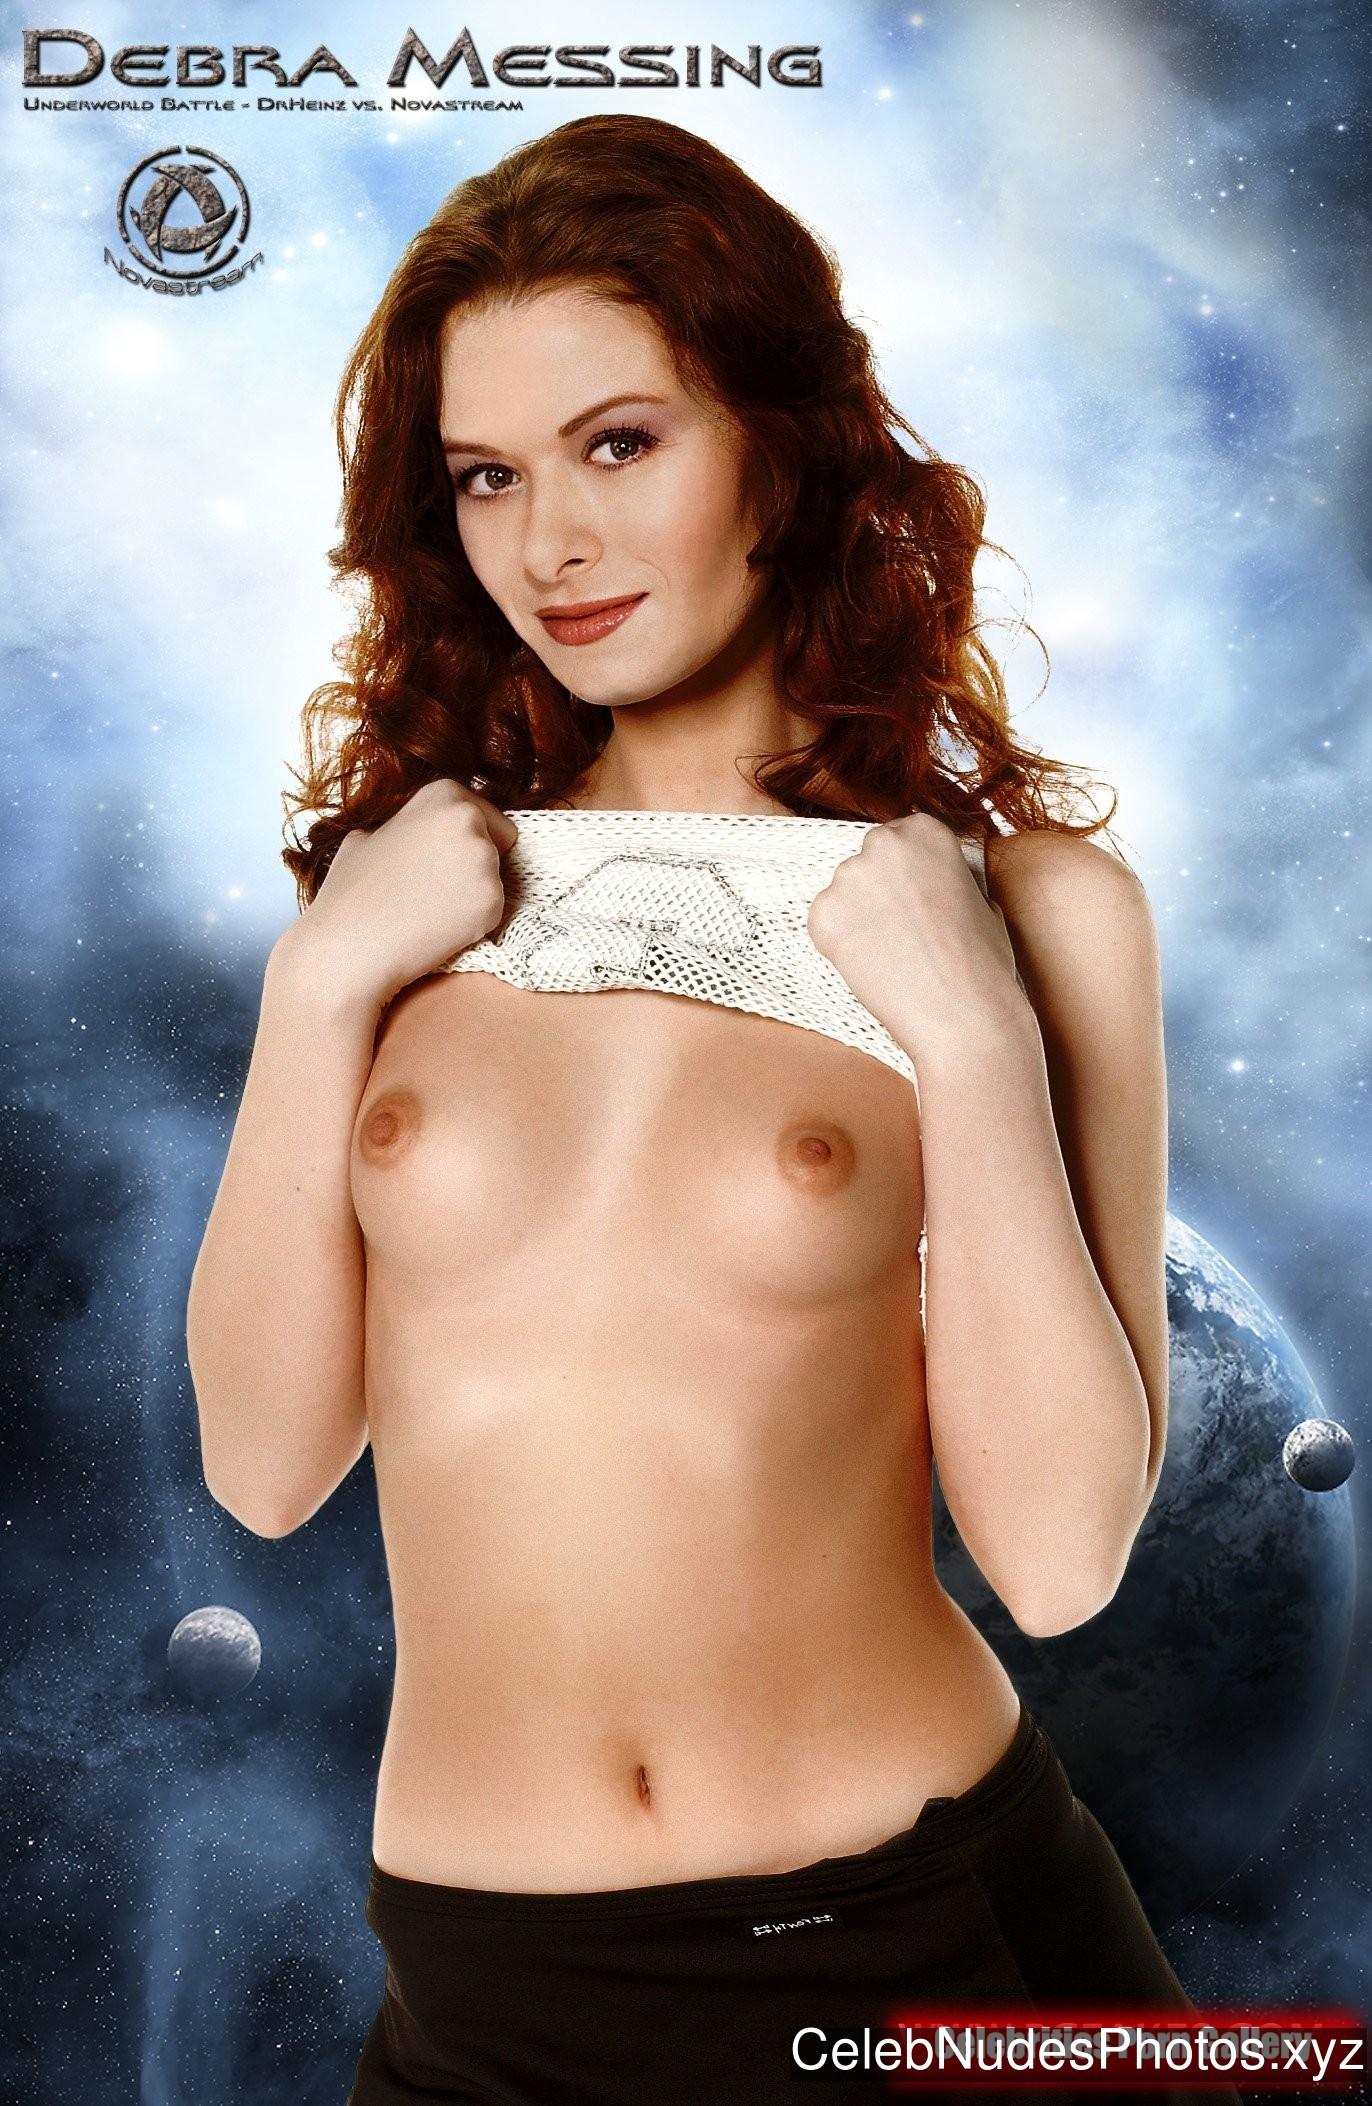 Debra Messing Free nude Celebrity sexy 18